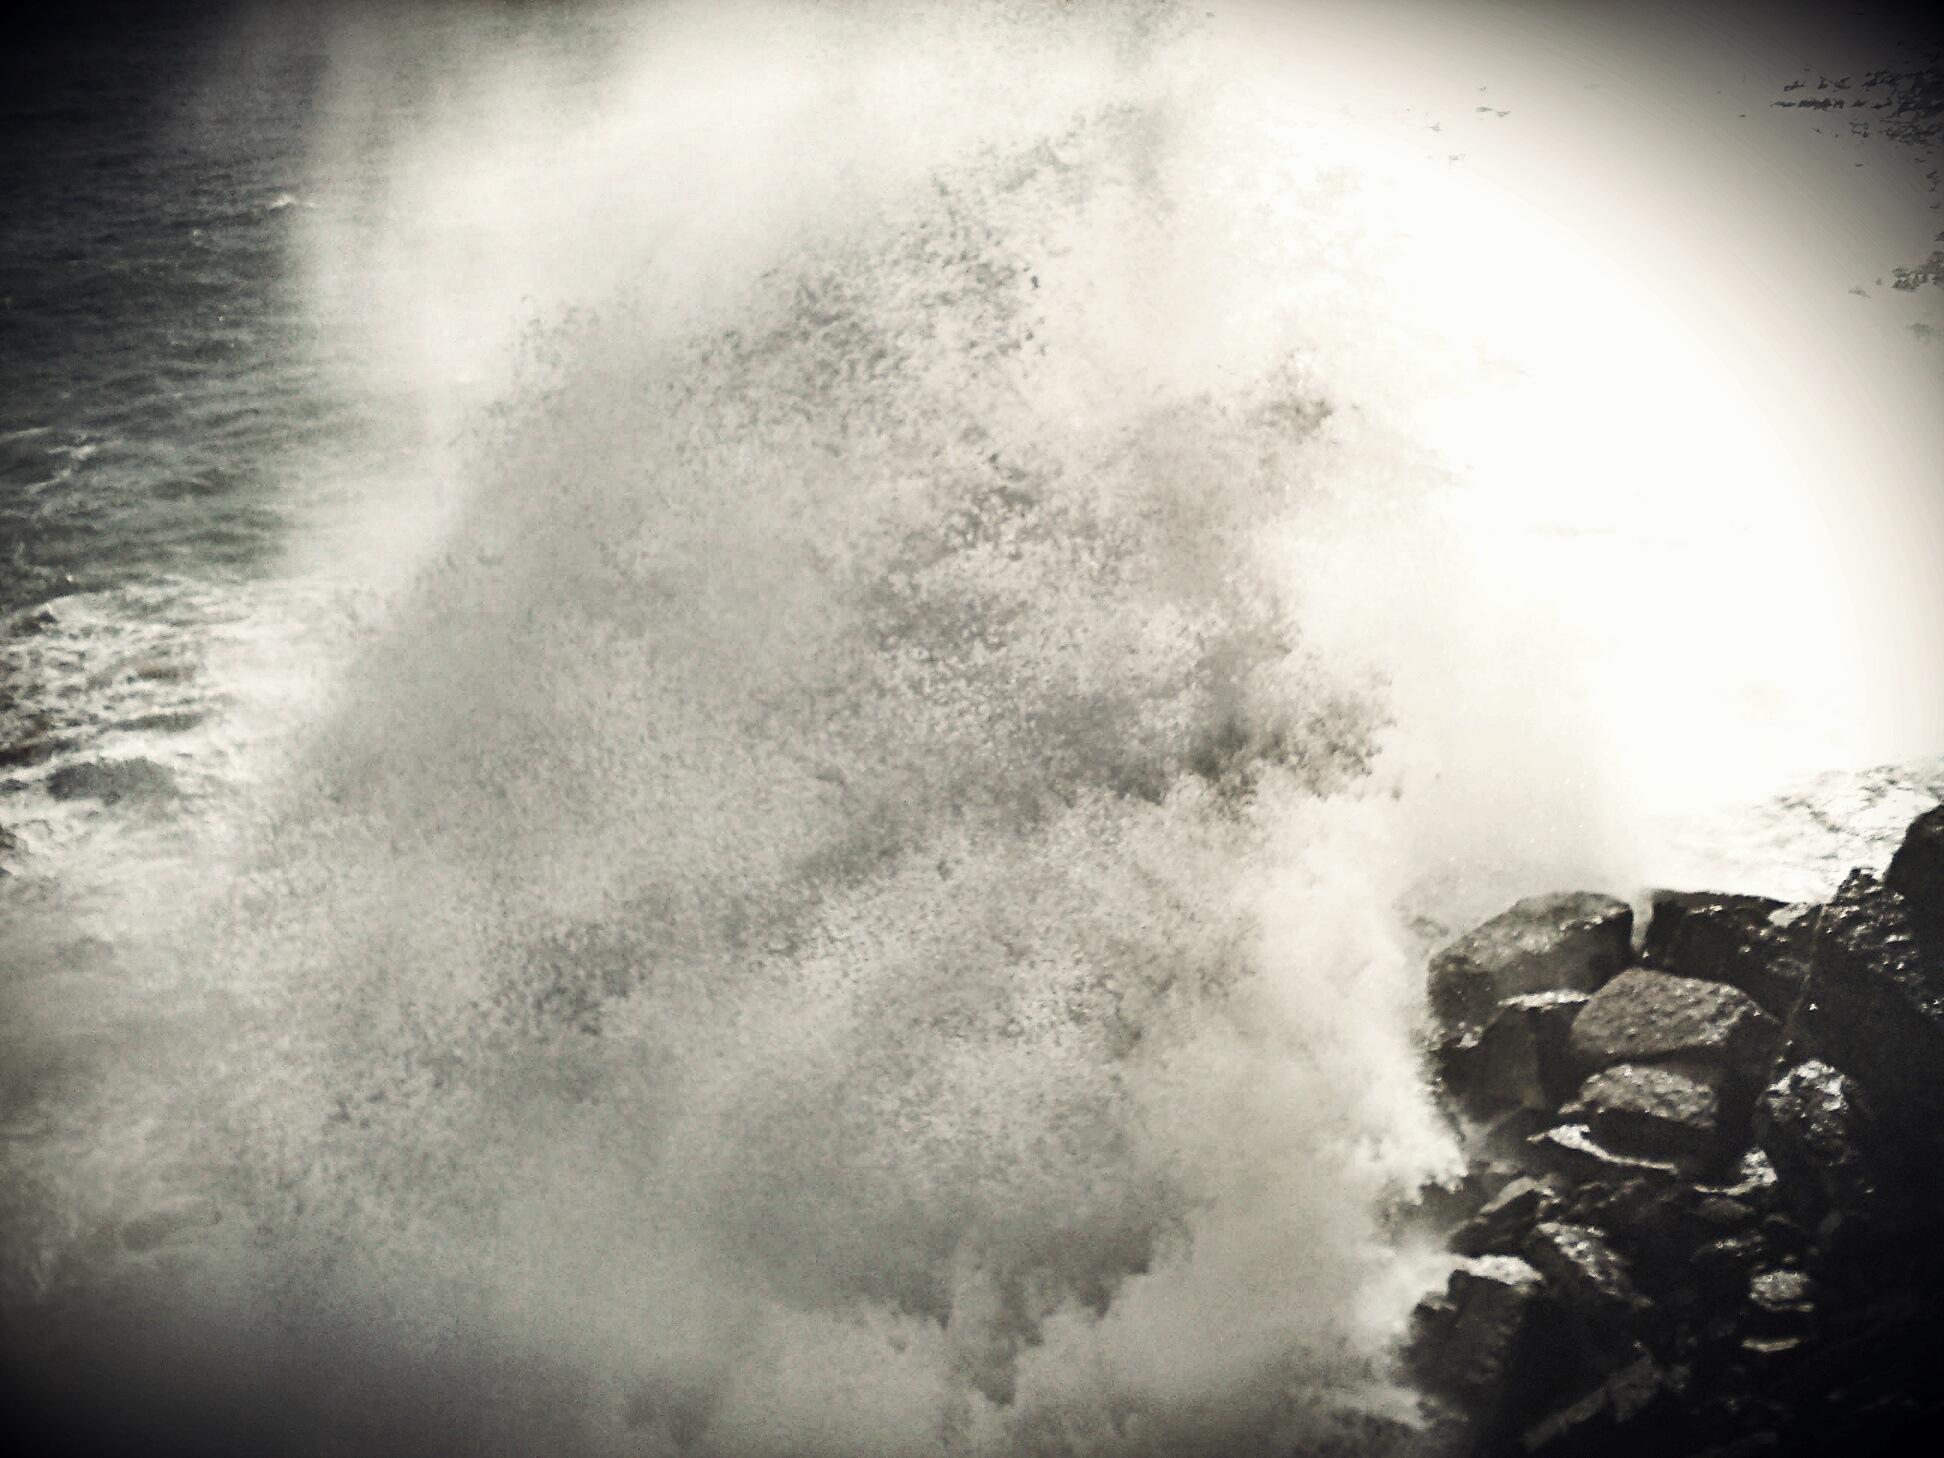 Big Wave by Bruno Miguel Sousa (Pr0m4xine)